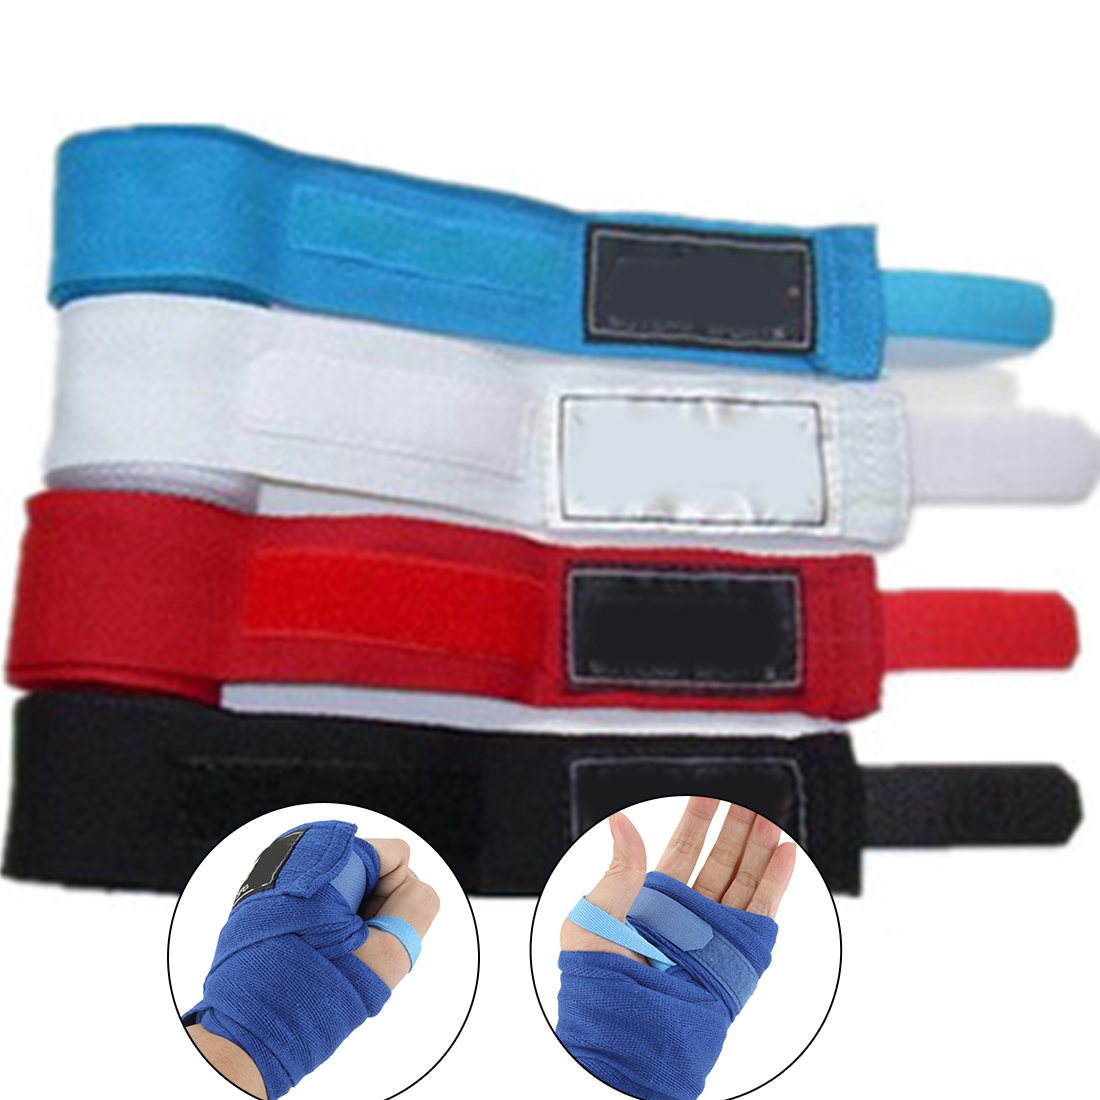 2PCS Thai Taekwondo Hand Sports Strap Men Gifts Gloves Wraps Boxing Bandage